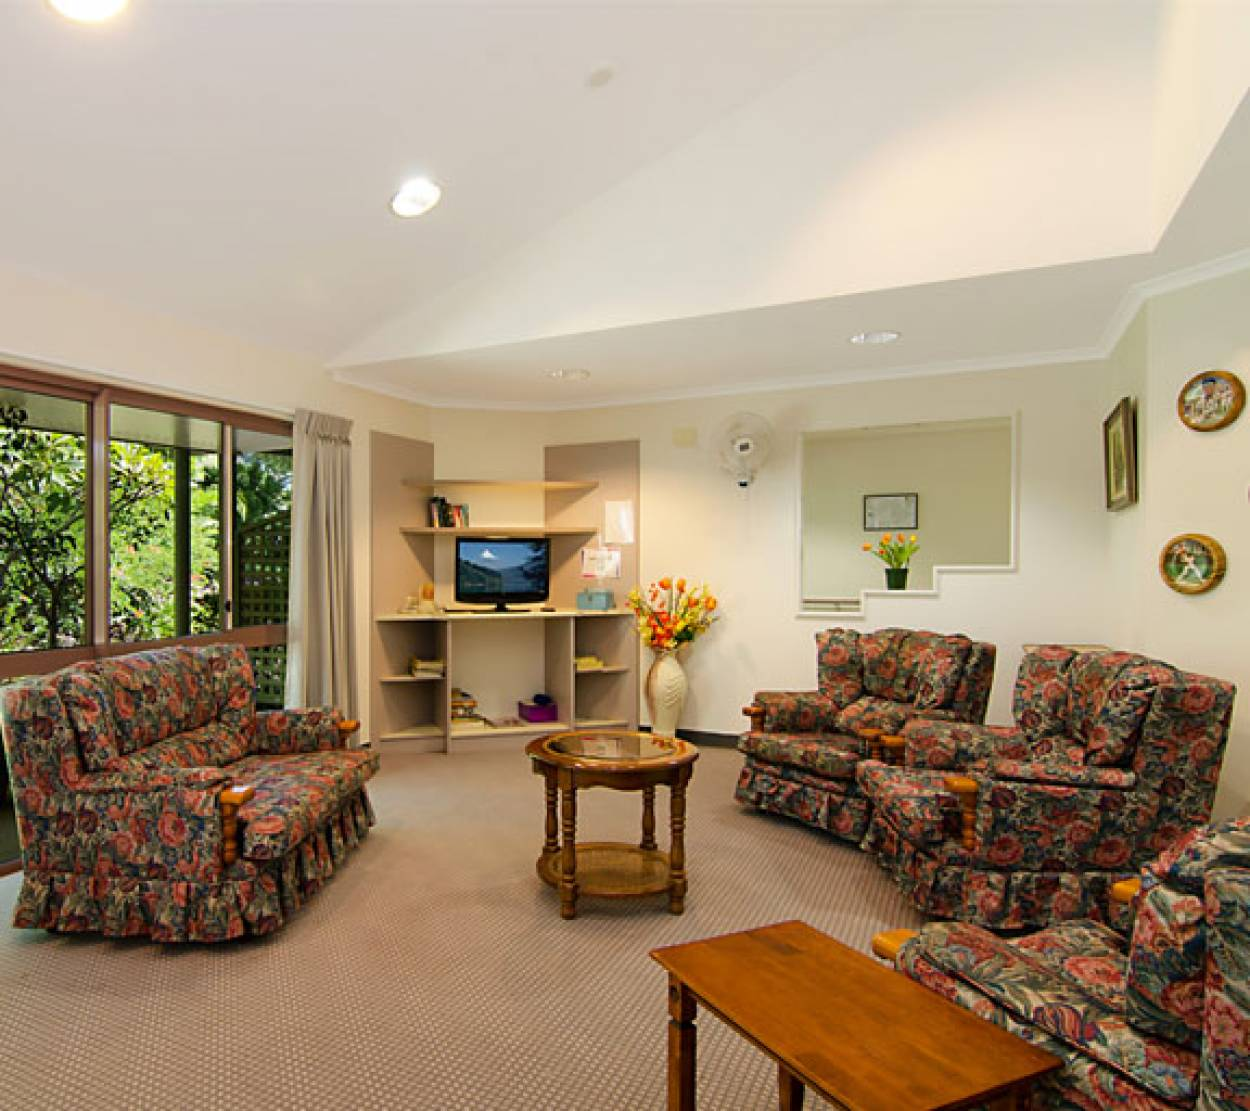 Bolton Clarke Centaur, Caloundra - Residential Aged Care